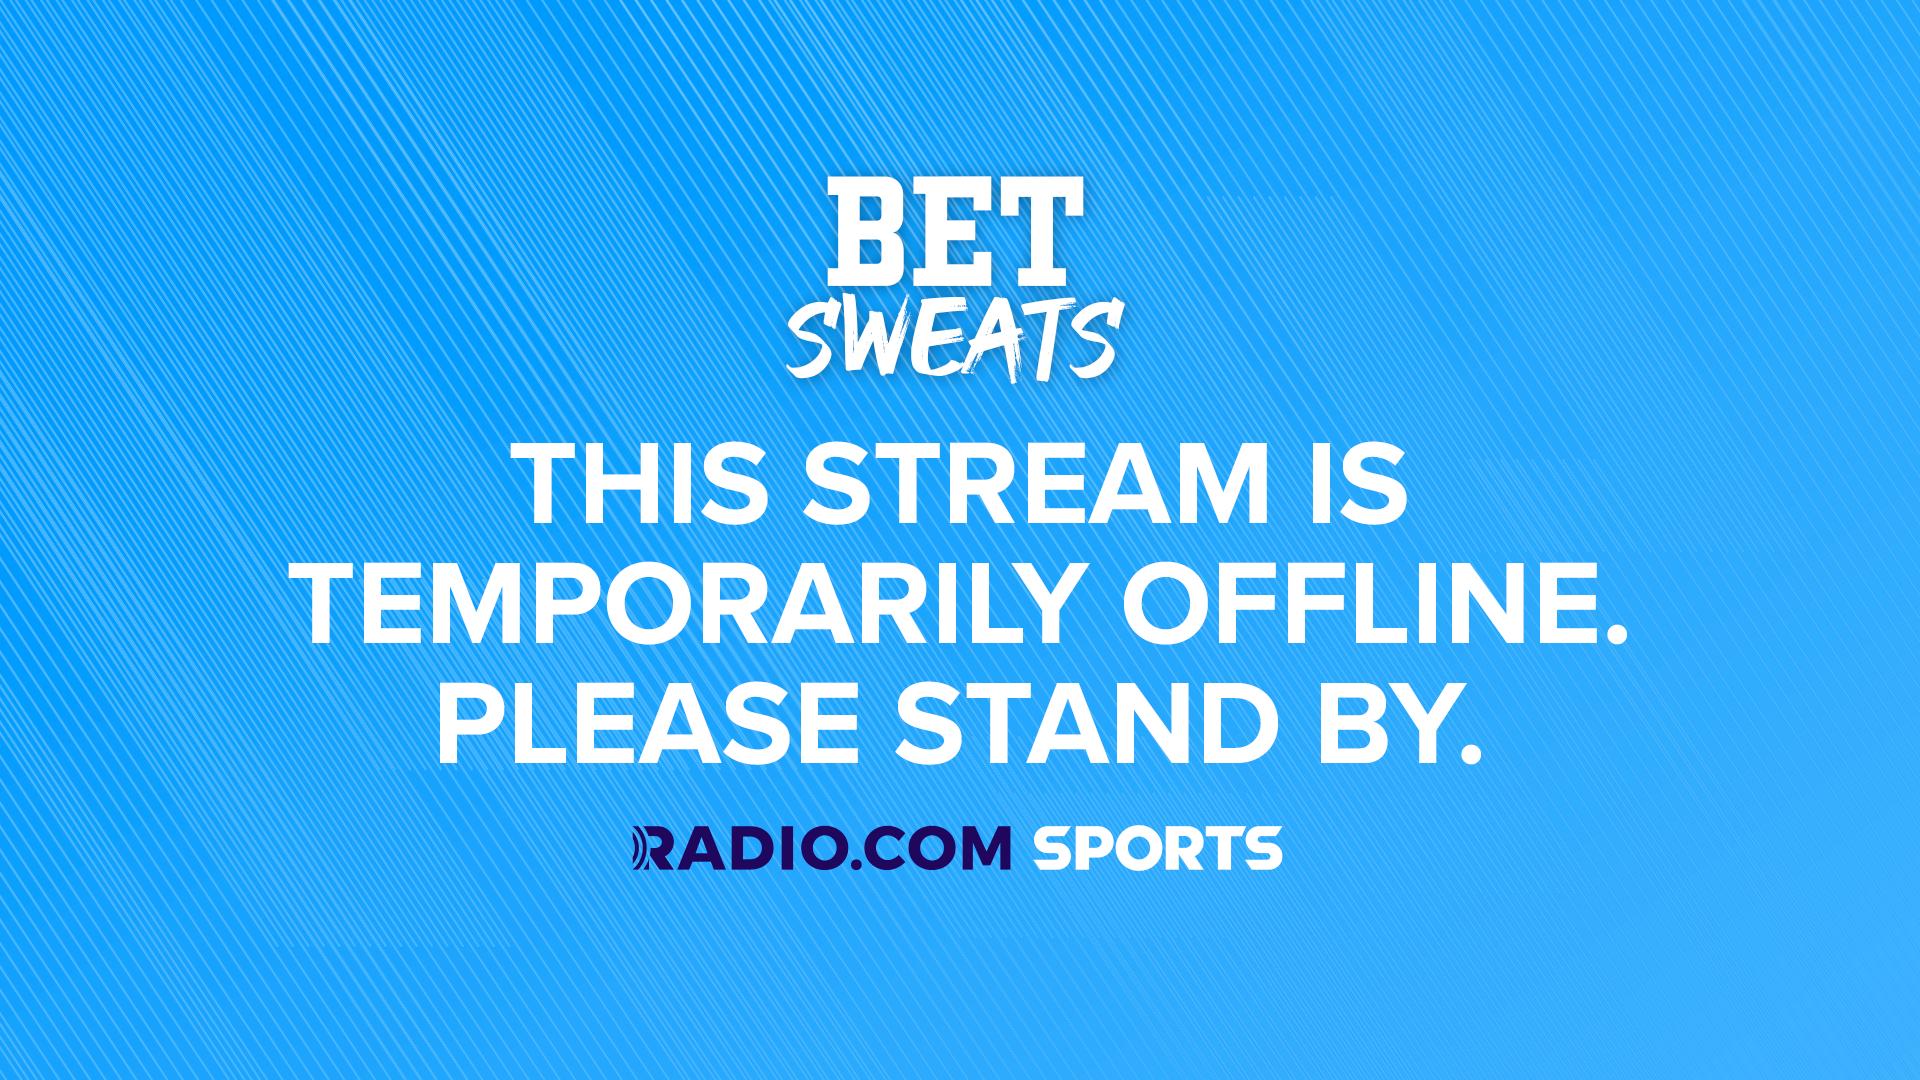 sports radio online mlb betting